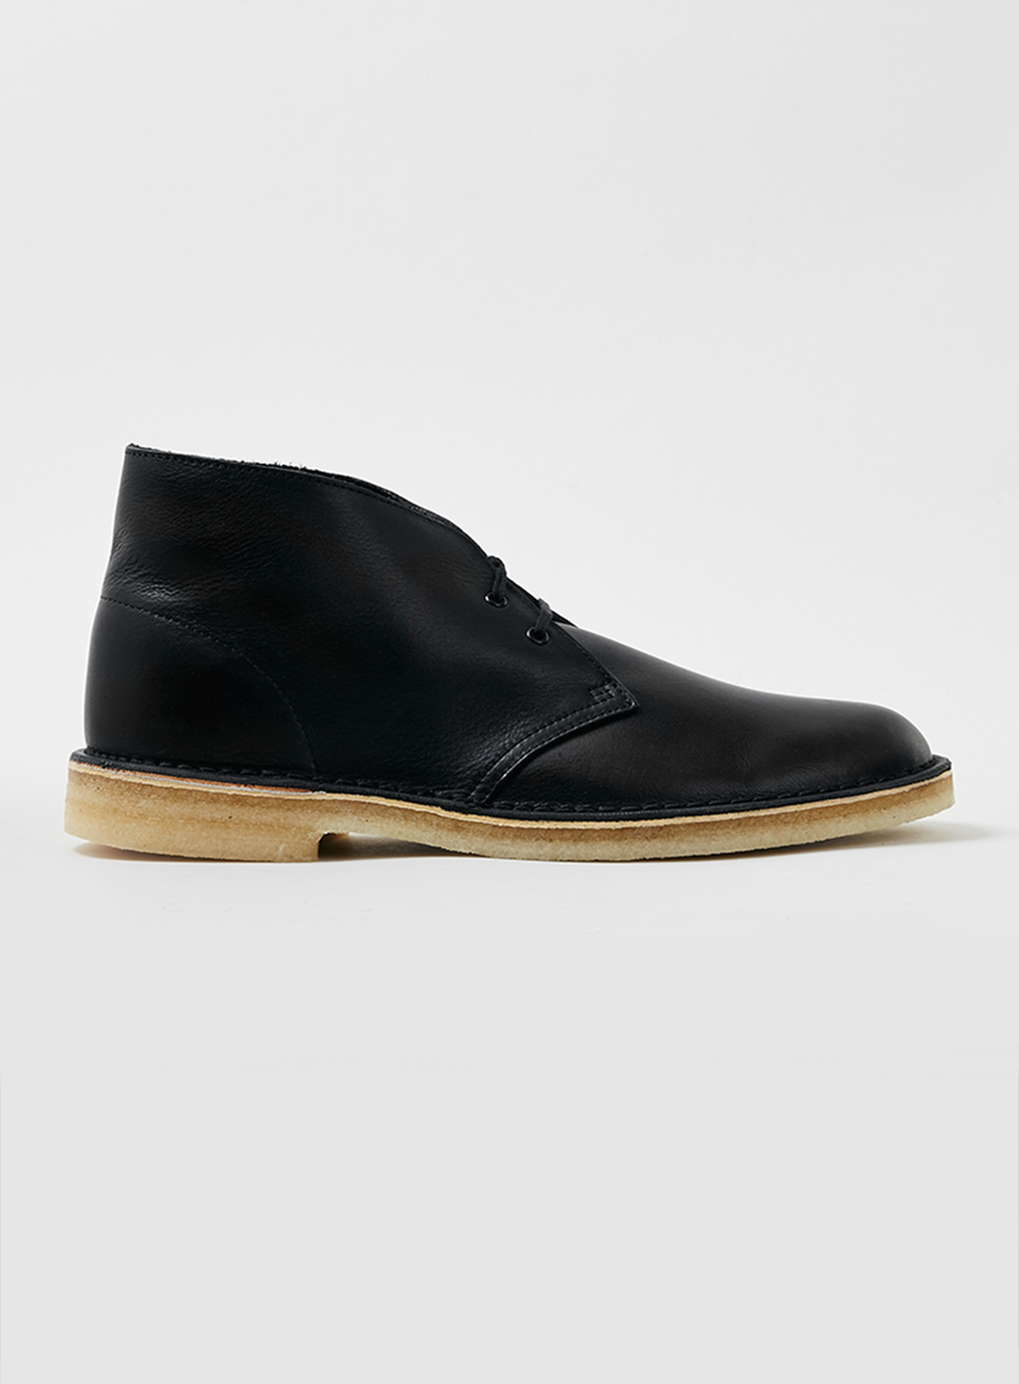 topman clarks original black leather desert boots in black